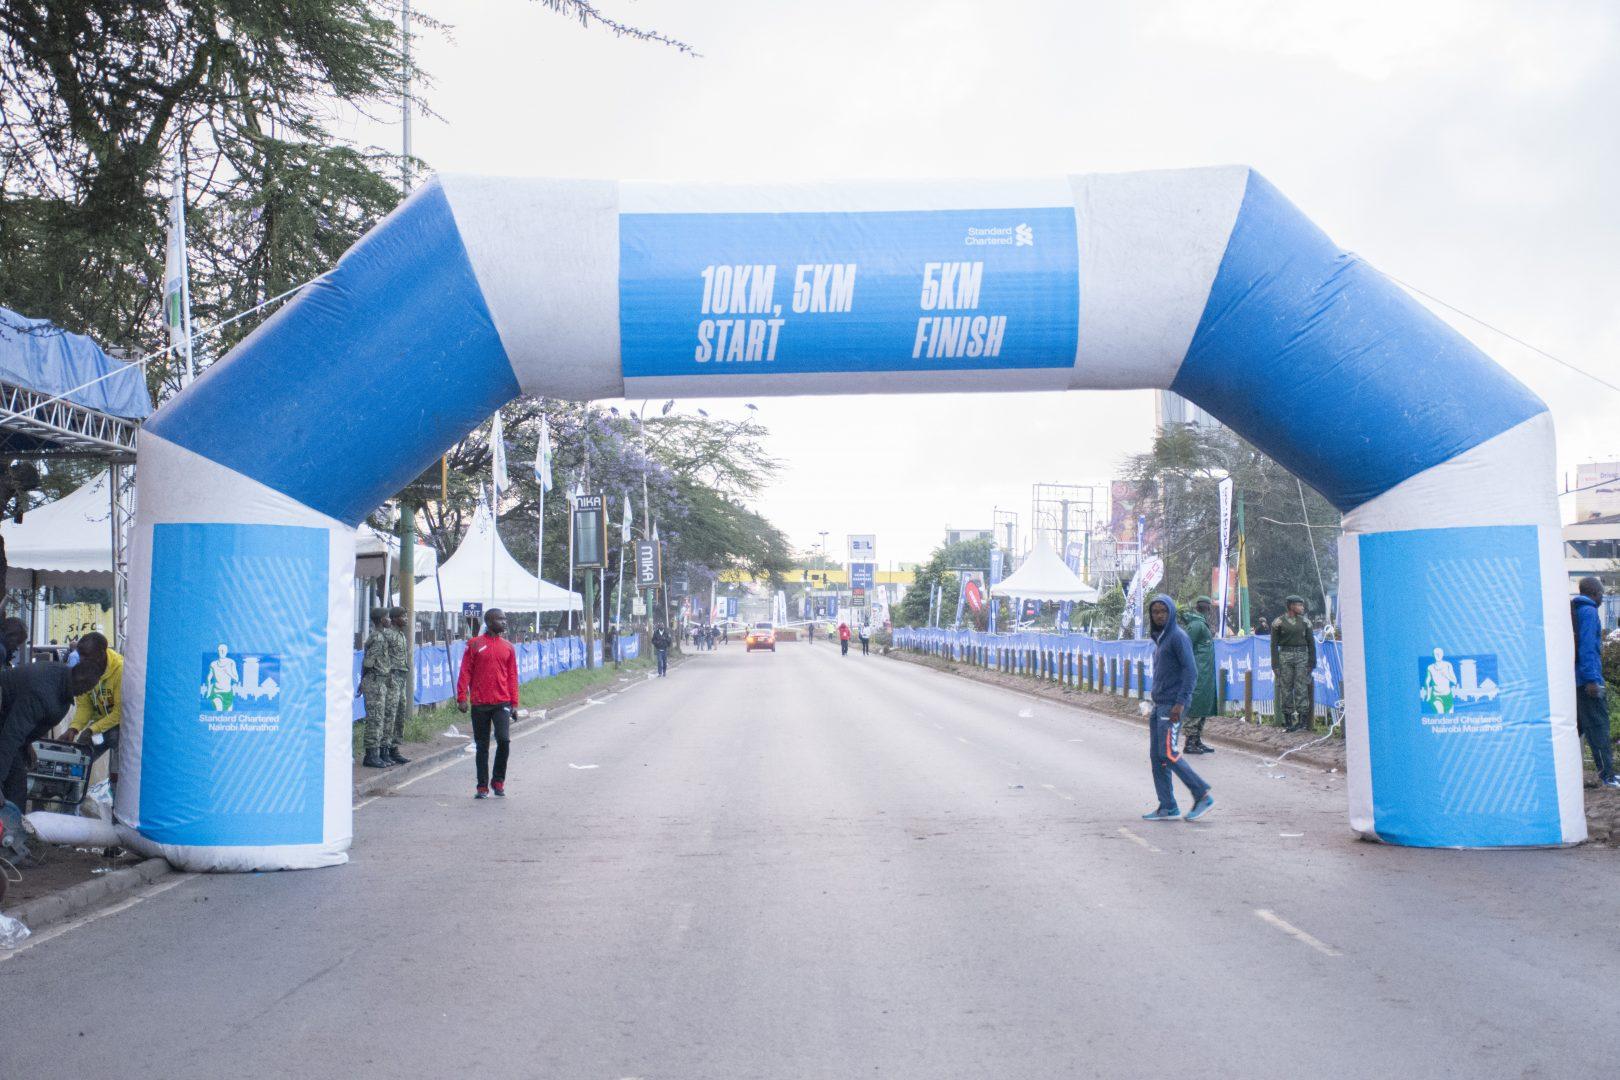 https://www.nairobimarathon.com/wp-content/uploads/2021/07/DSC_2841.jpg